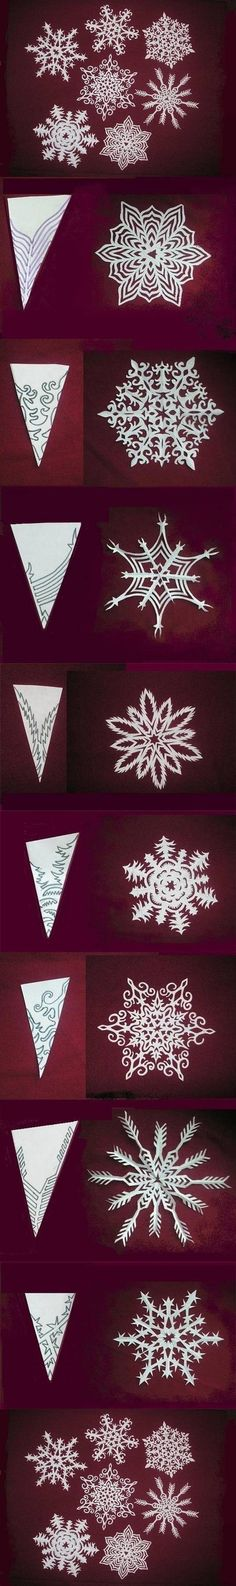 DIY Papier-Schneeflocken